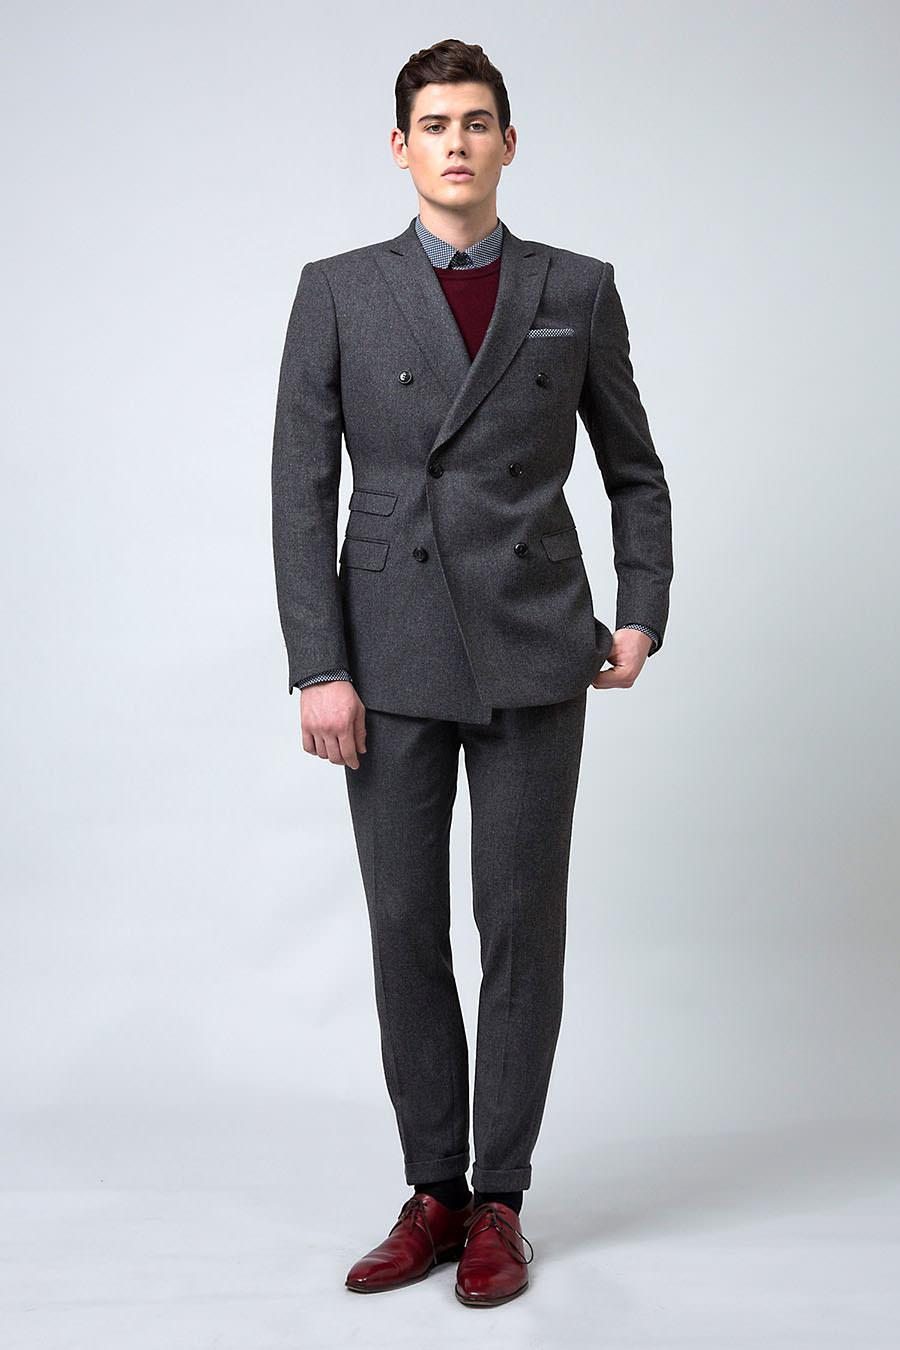 samonsurmesureH16 costume croise gris - web